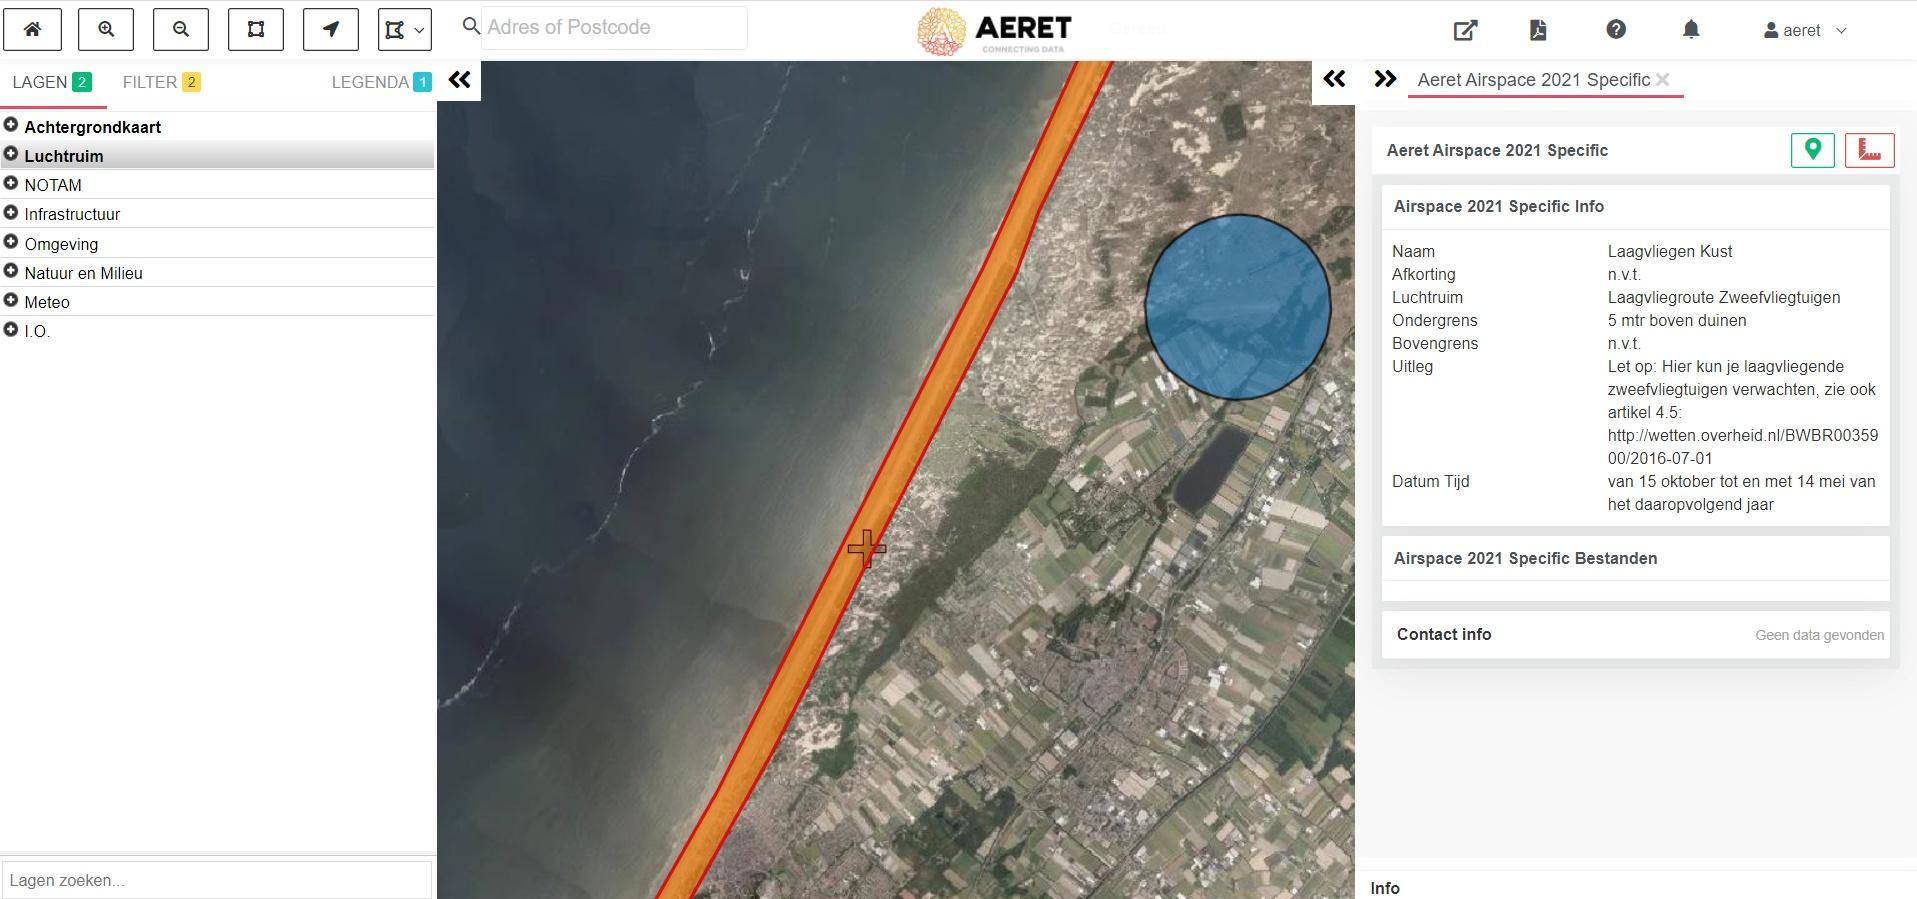 drone preflight pro kaart open specific zweefvliegtuigen duinen